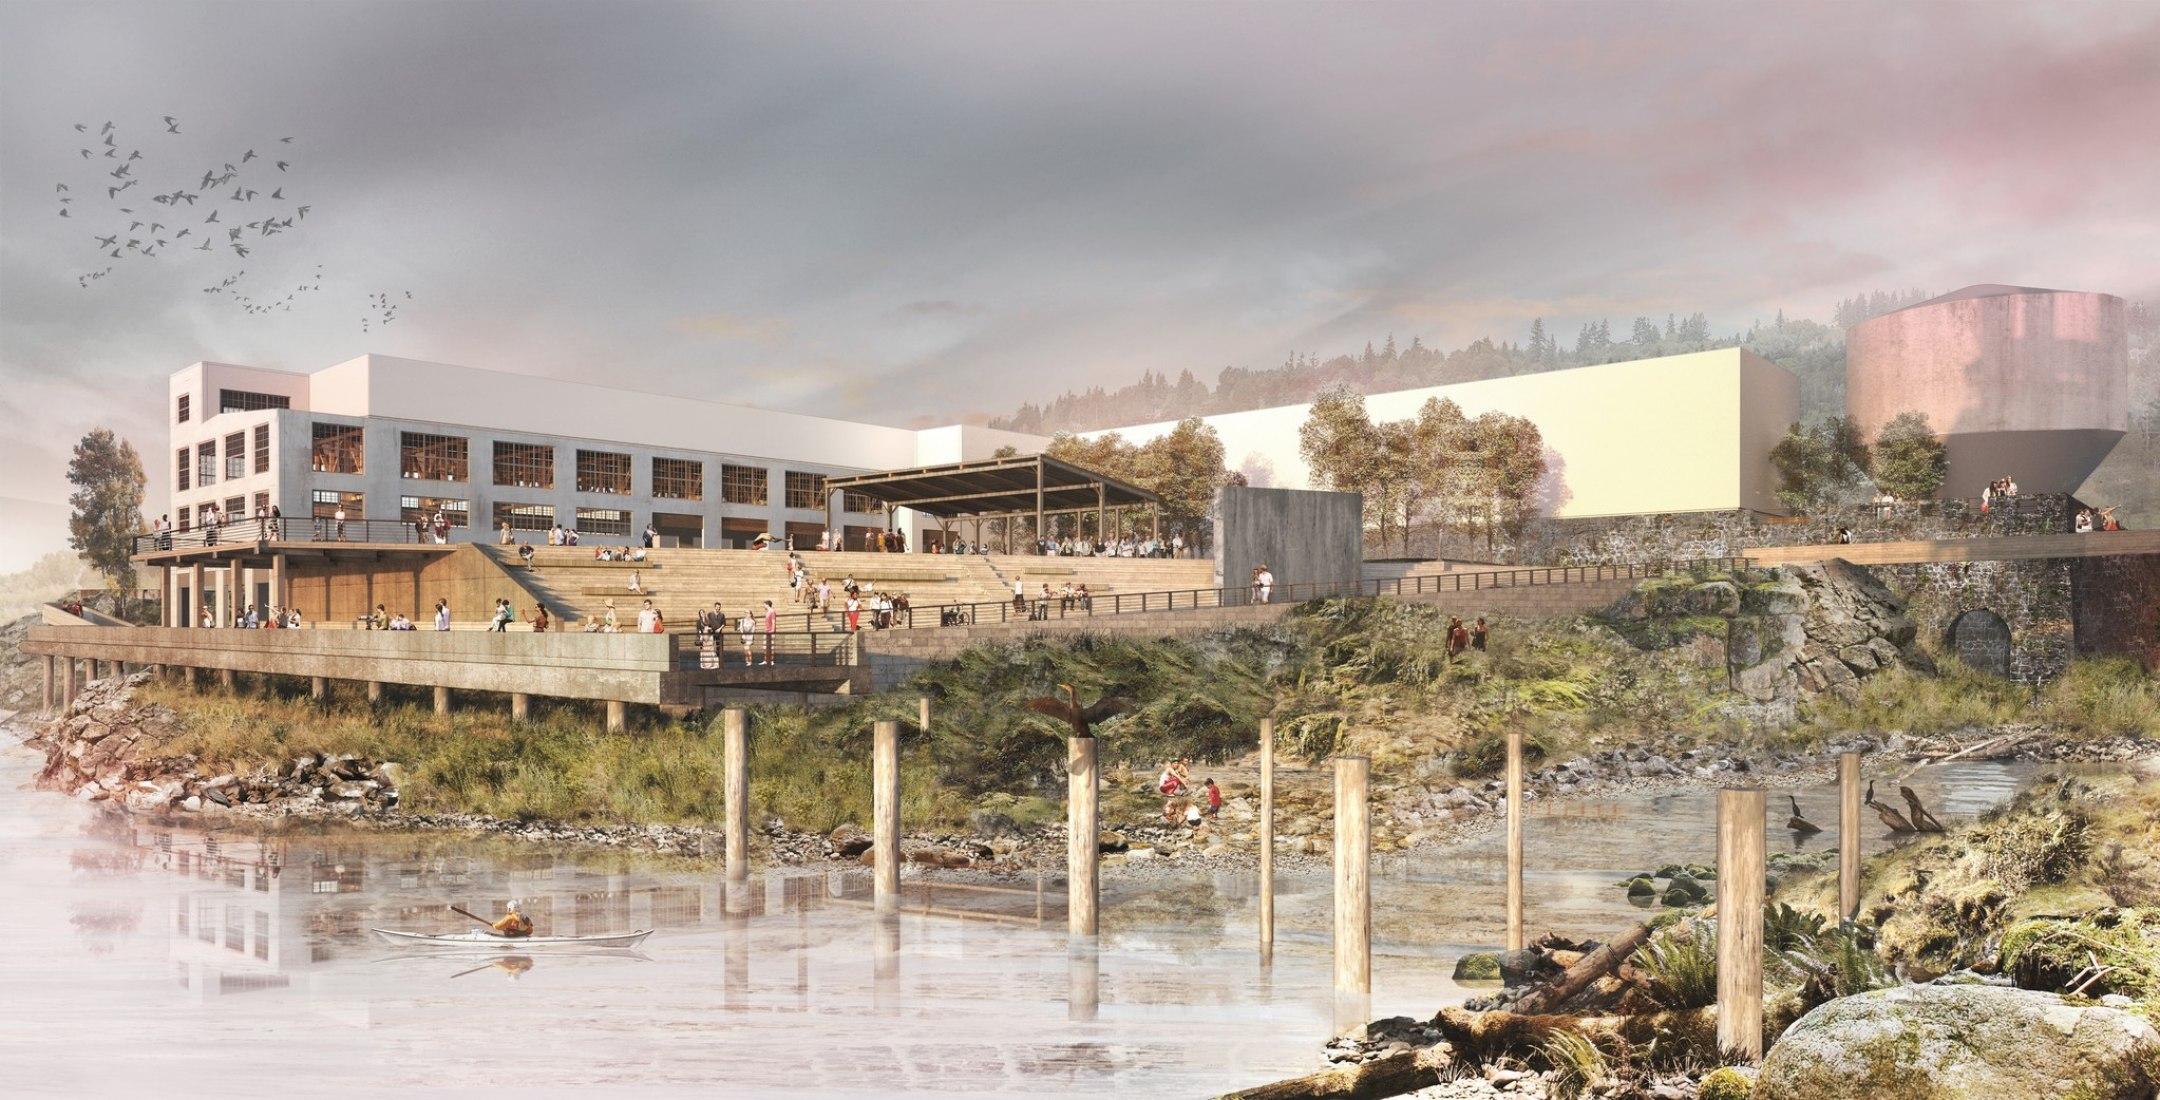 Render. Snøhetta design the public spaces that will allow visitors to rediscover Willamette Falls Riverwalk. Image courtesy of Snøhetta